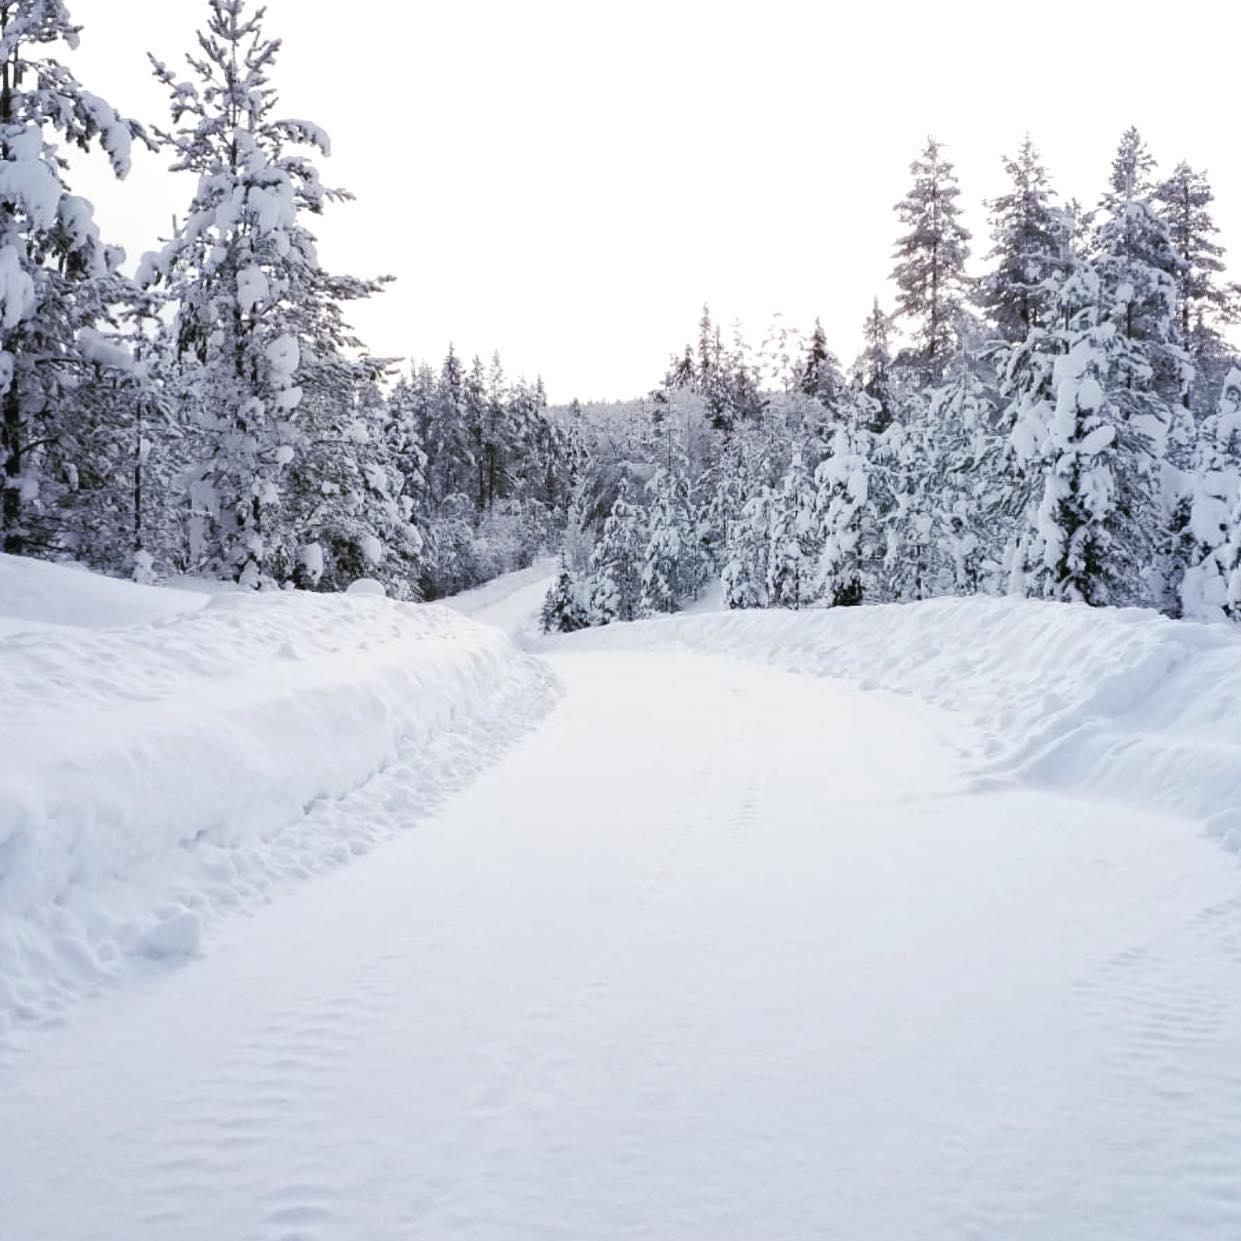 WRC: Συνέχεια του Πρωταθλήματος με Arctic Rally Φινλανδίας